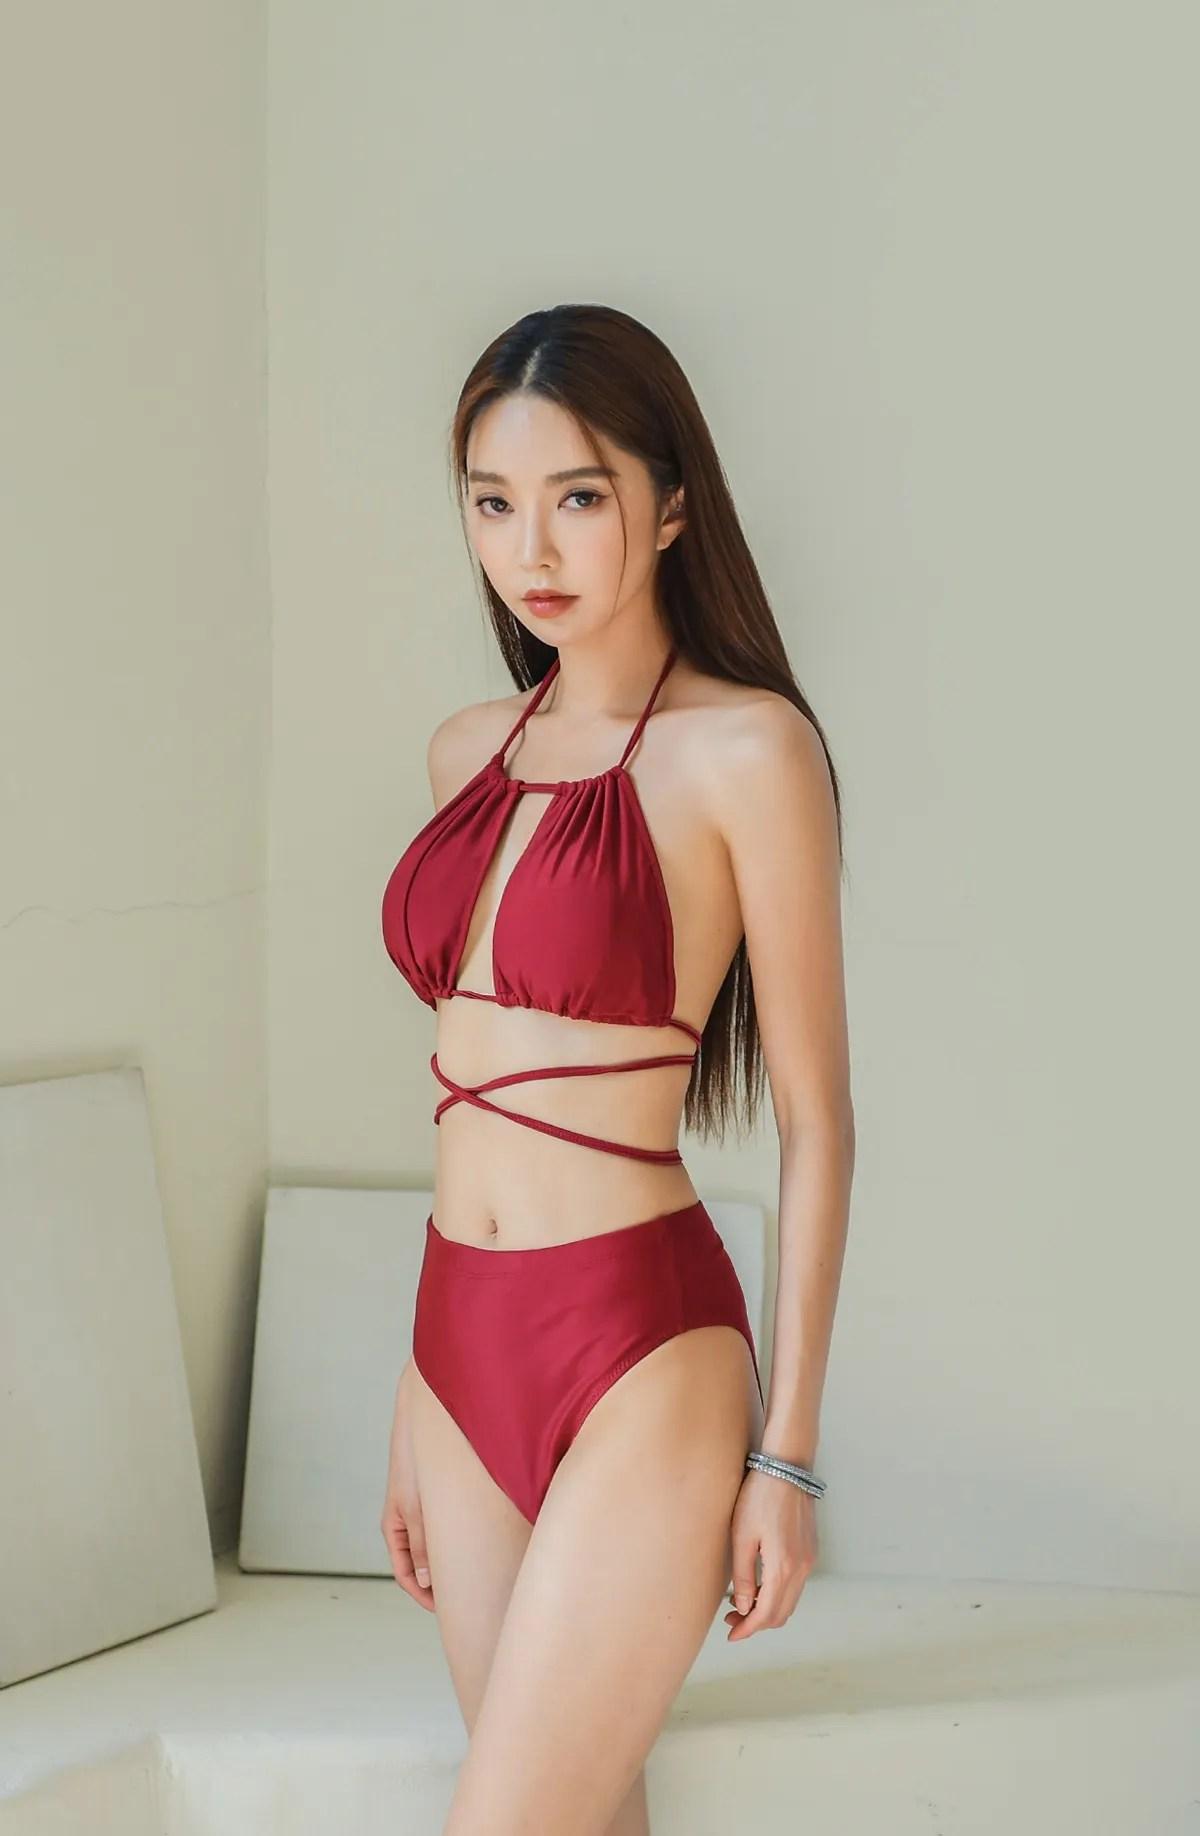 Park Suyeon / vendis / September 2021 / Tandy Bikini